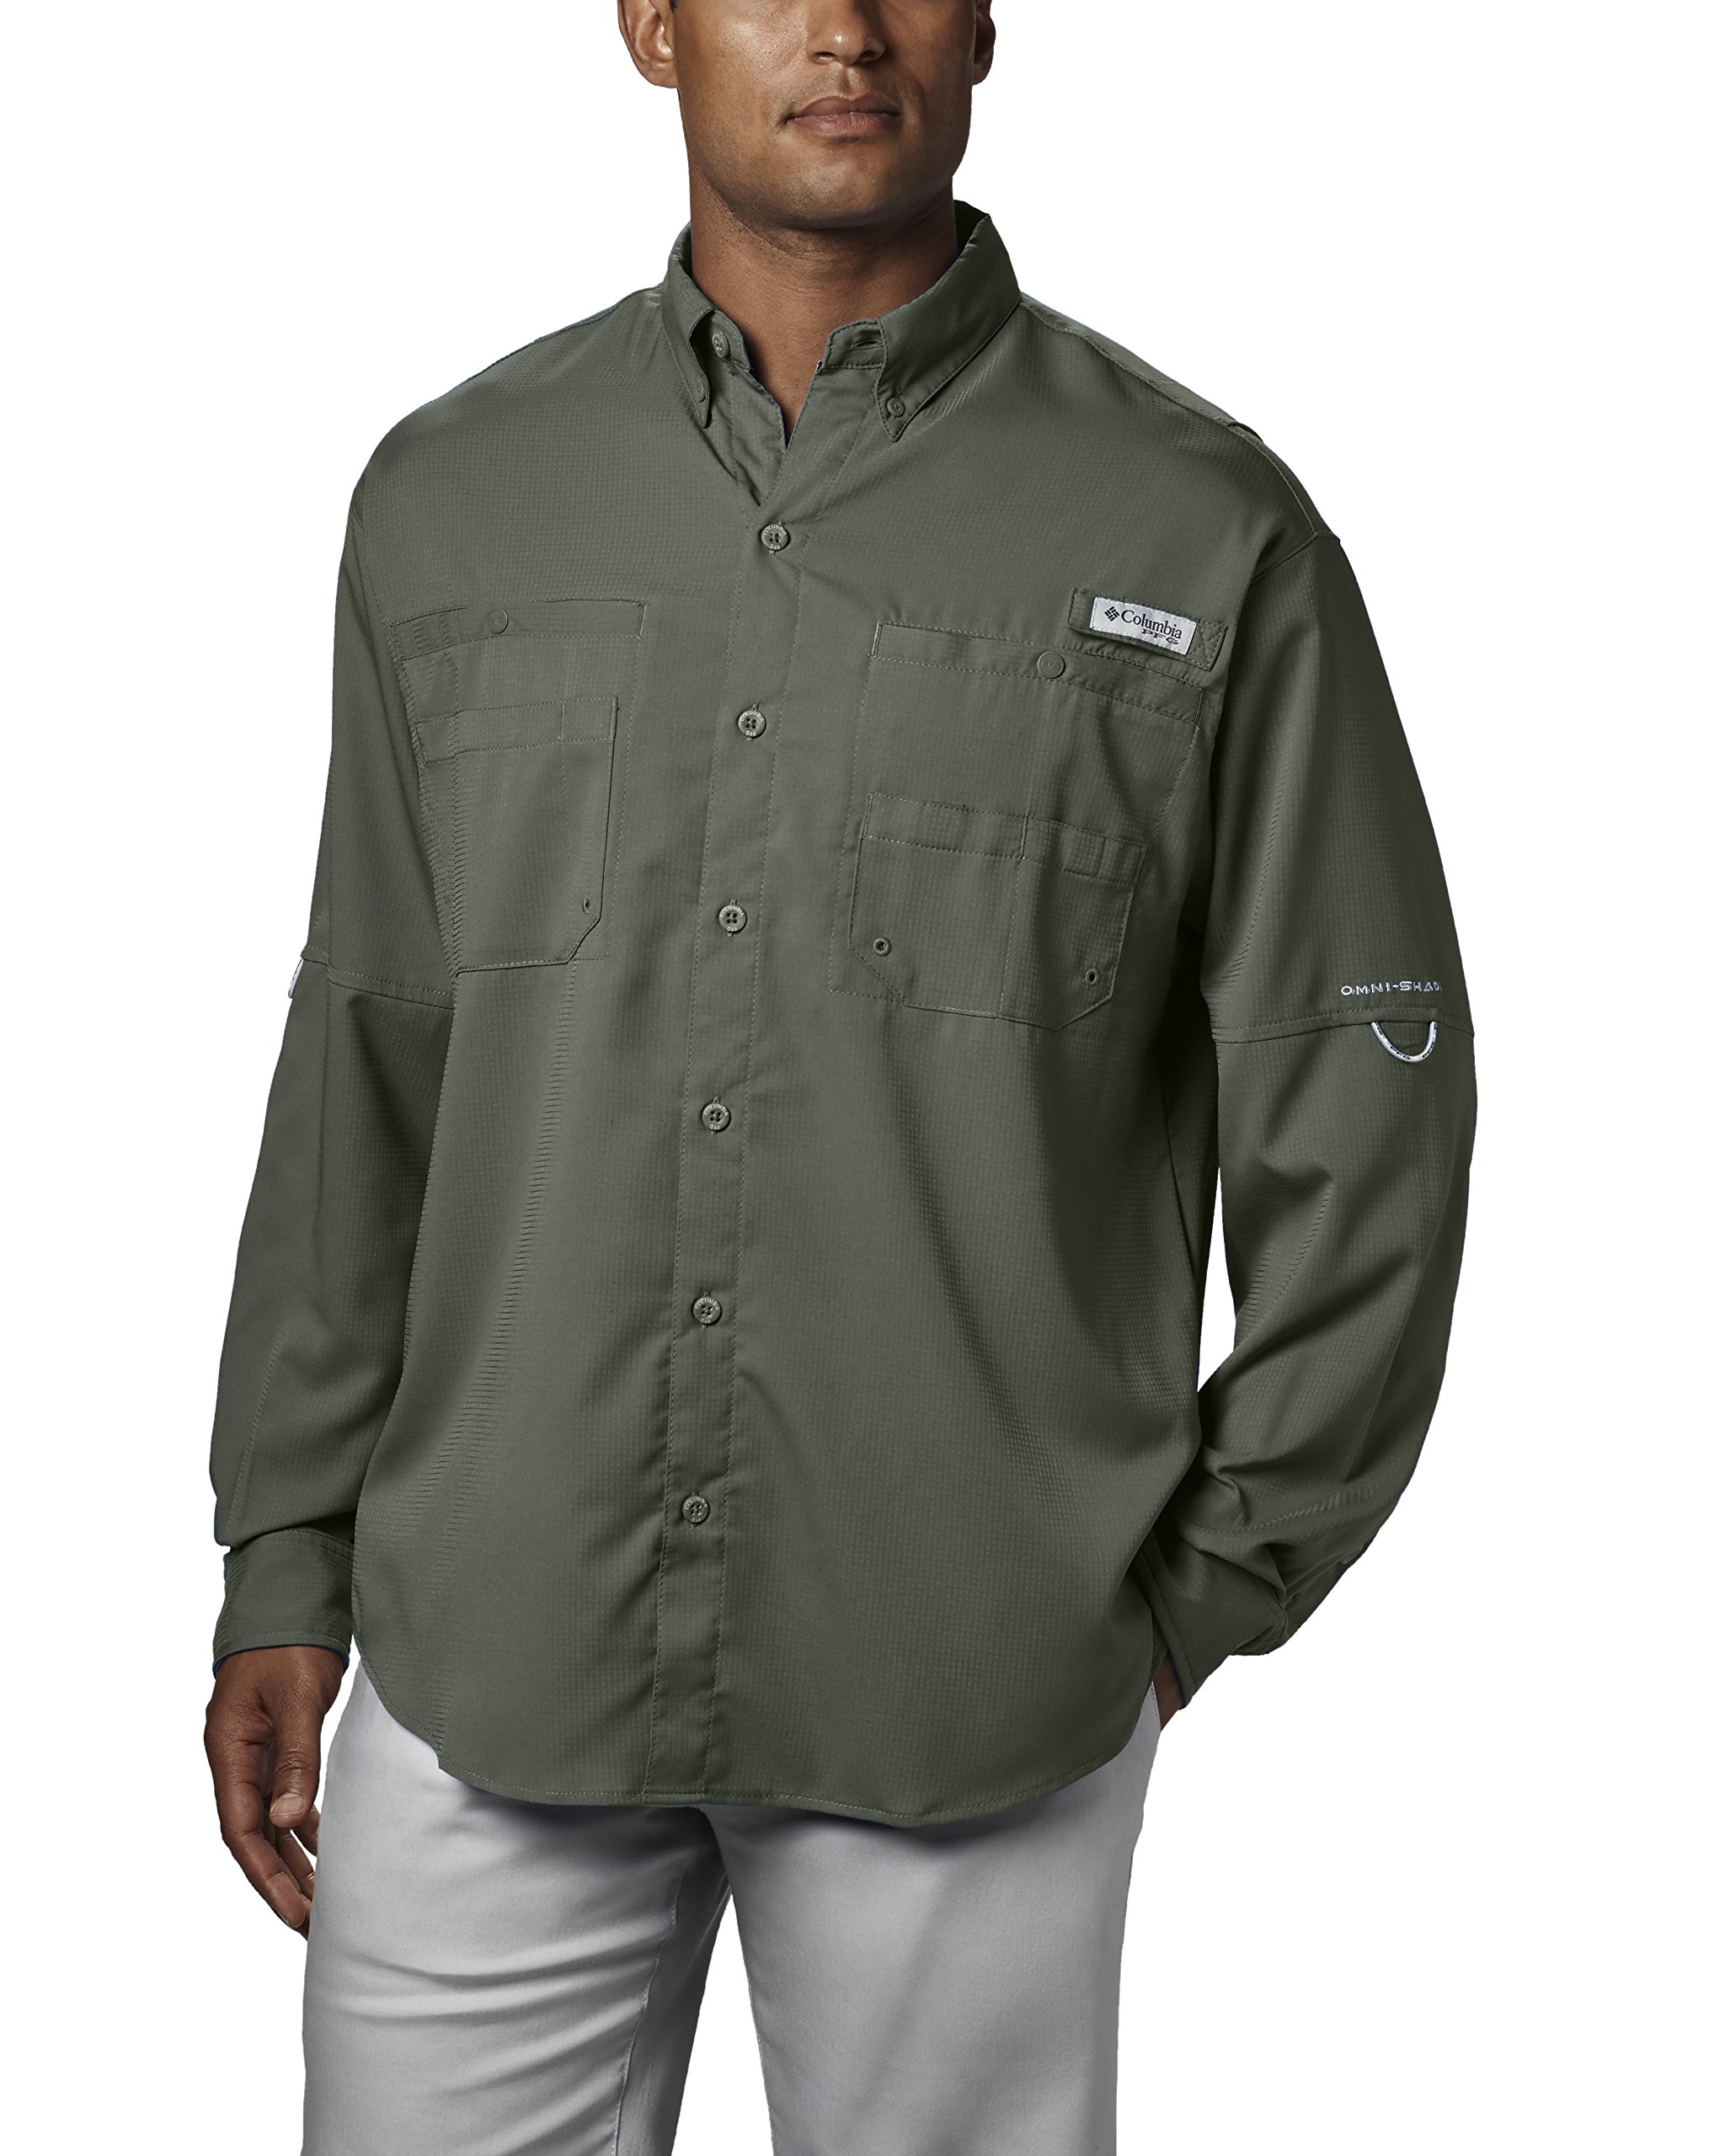 8b681774c73 Columbia Men's Plus Tamiami II Long Sleeve Shirt, Cypress - XX-Large |  Amazon 智慧估價| 得利購DirectGo - 海運,空運,美國代購美國代買